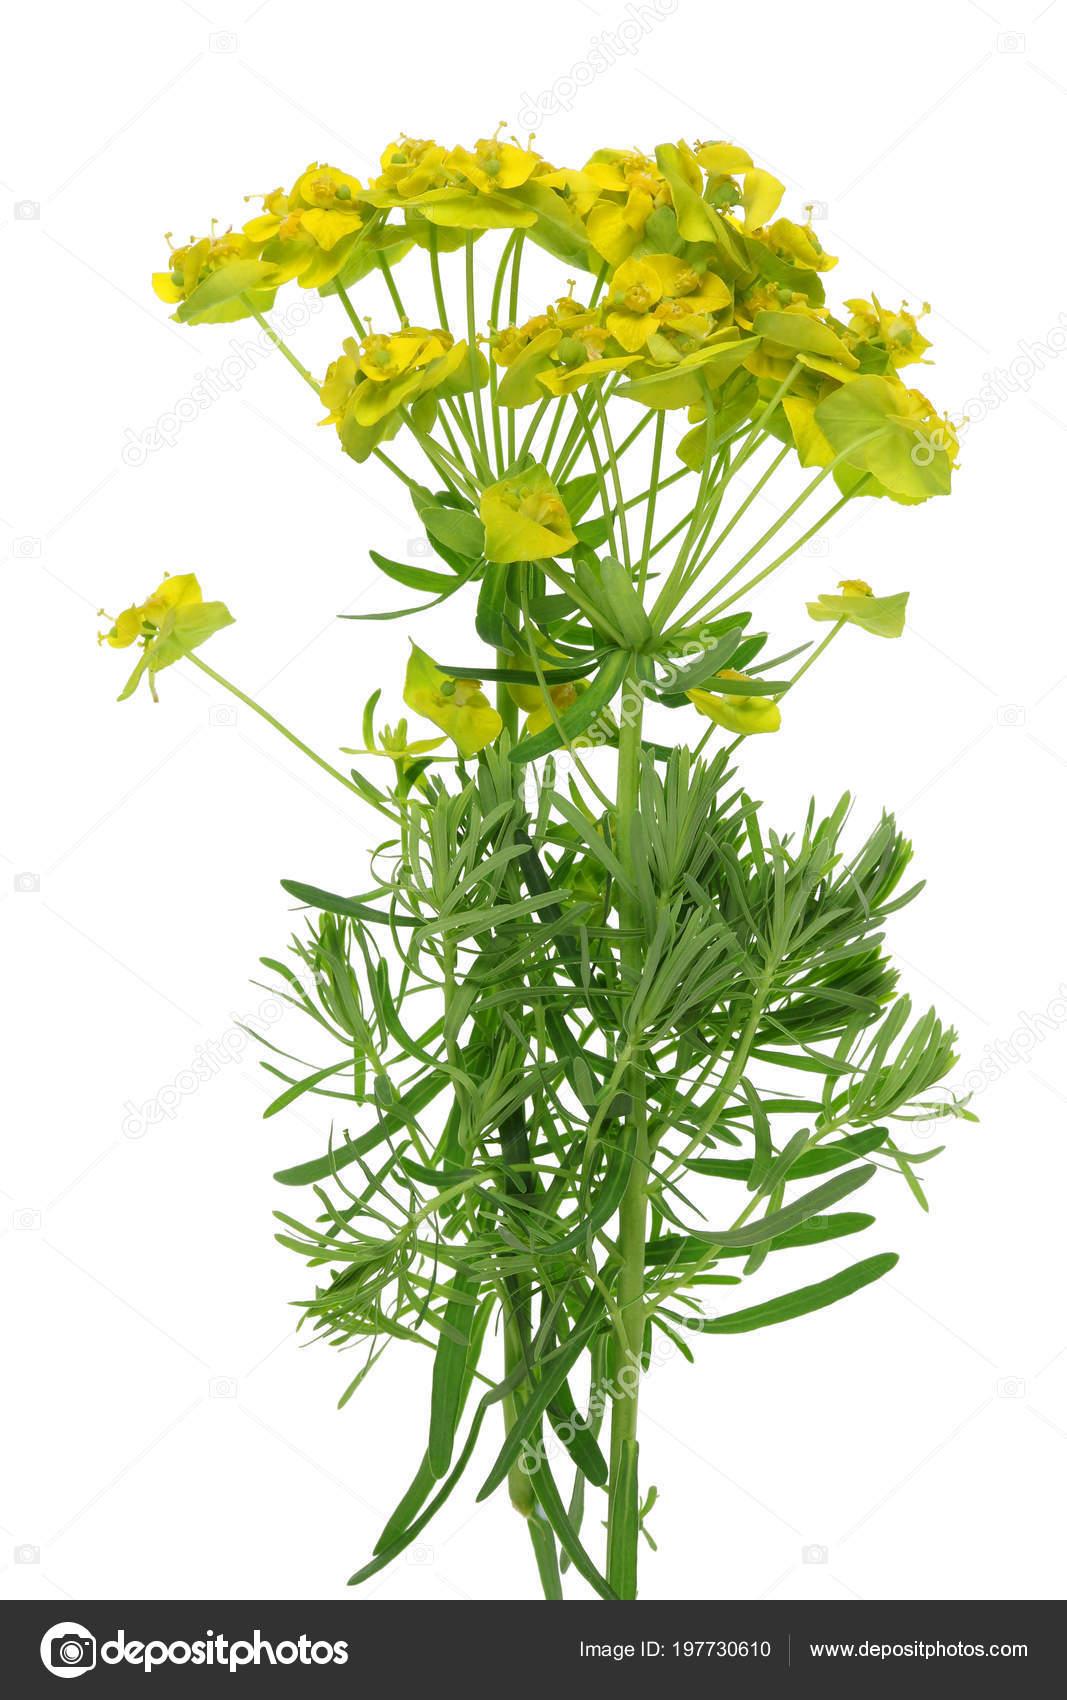 Euphorbia Garden Weed Plant White Caustic Poisonous Juice Spring